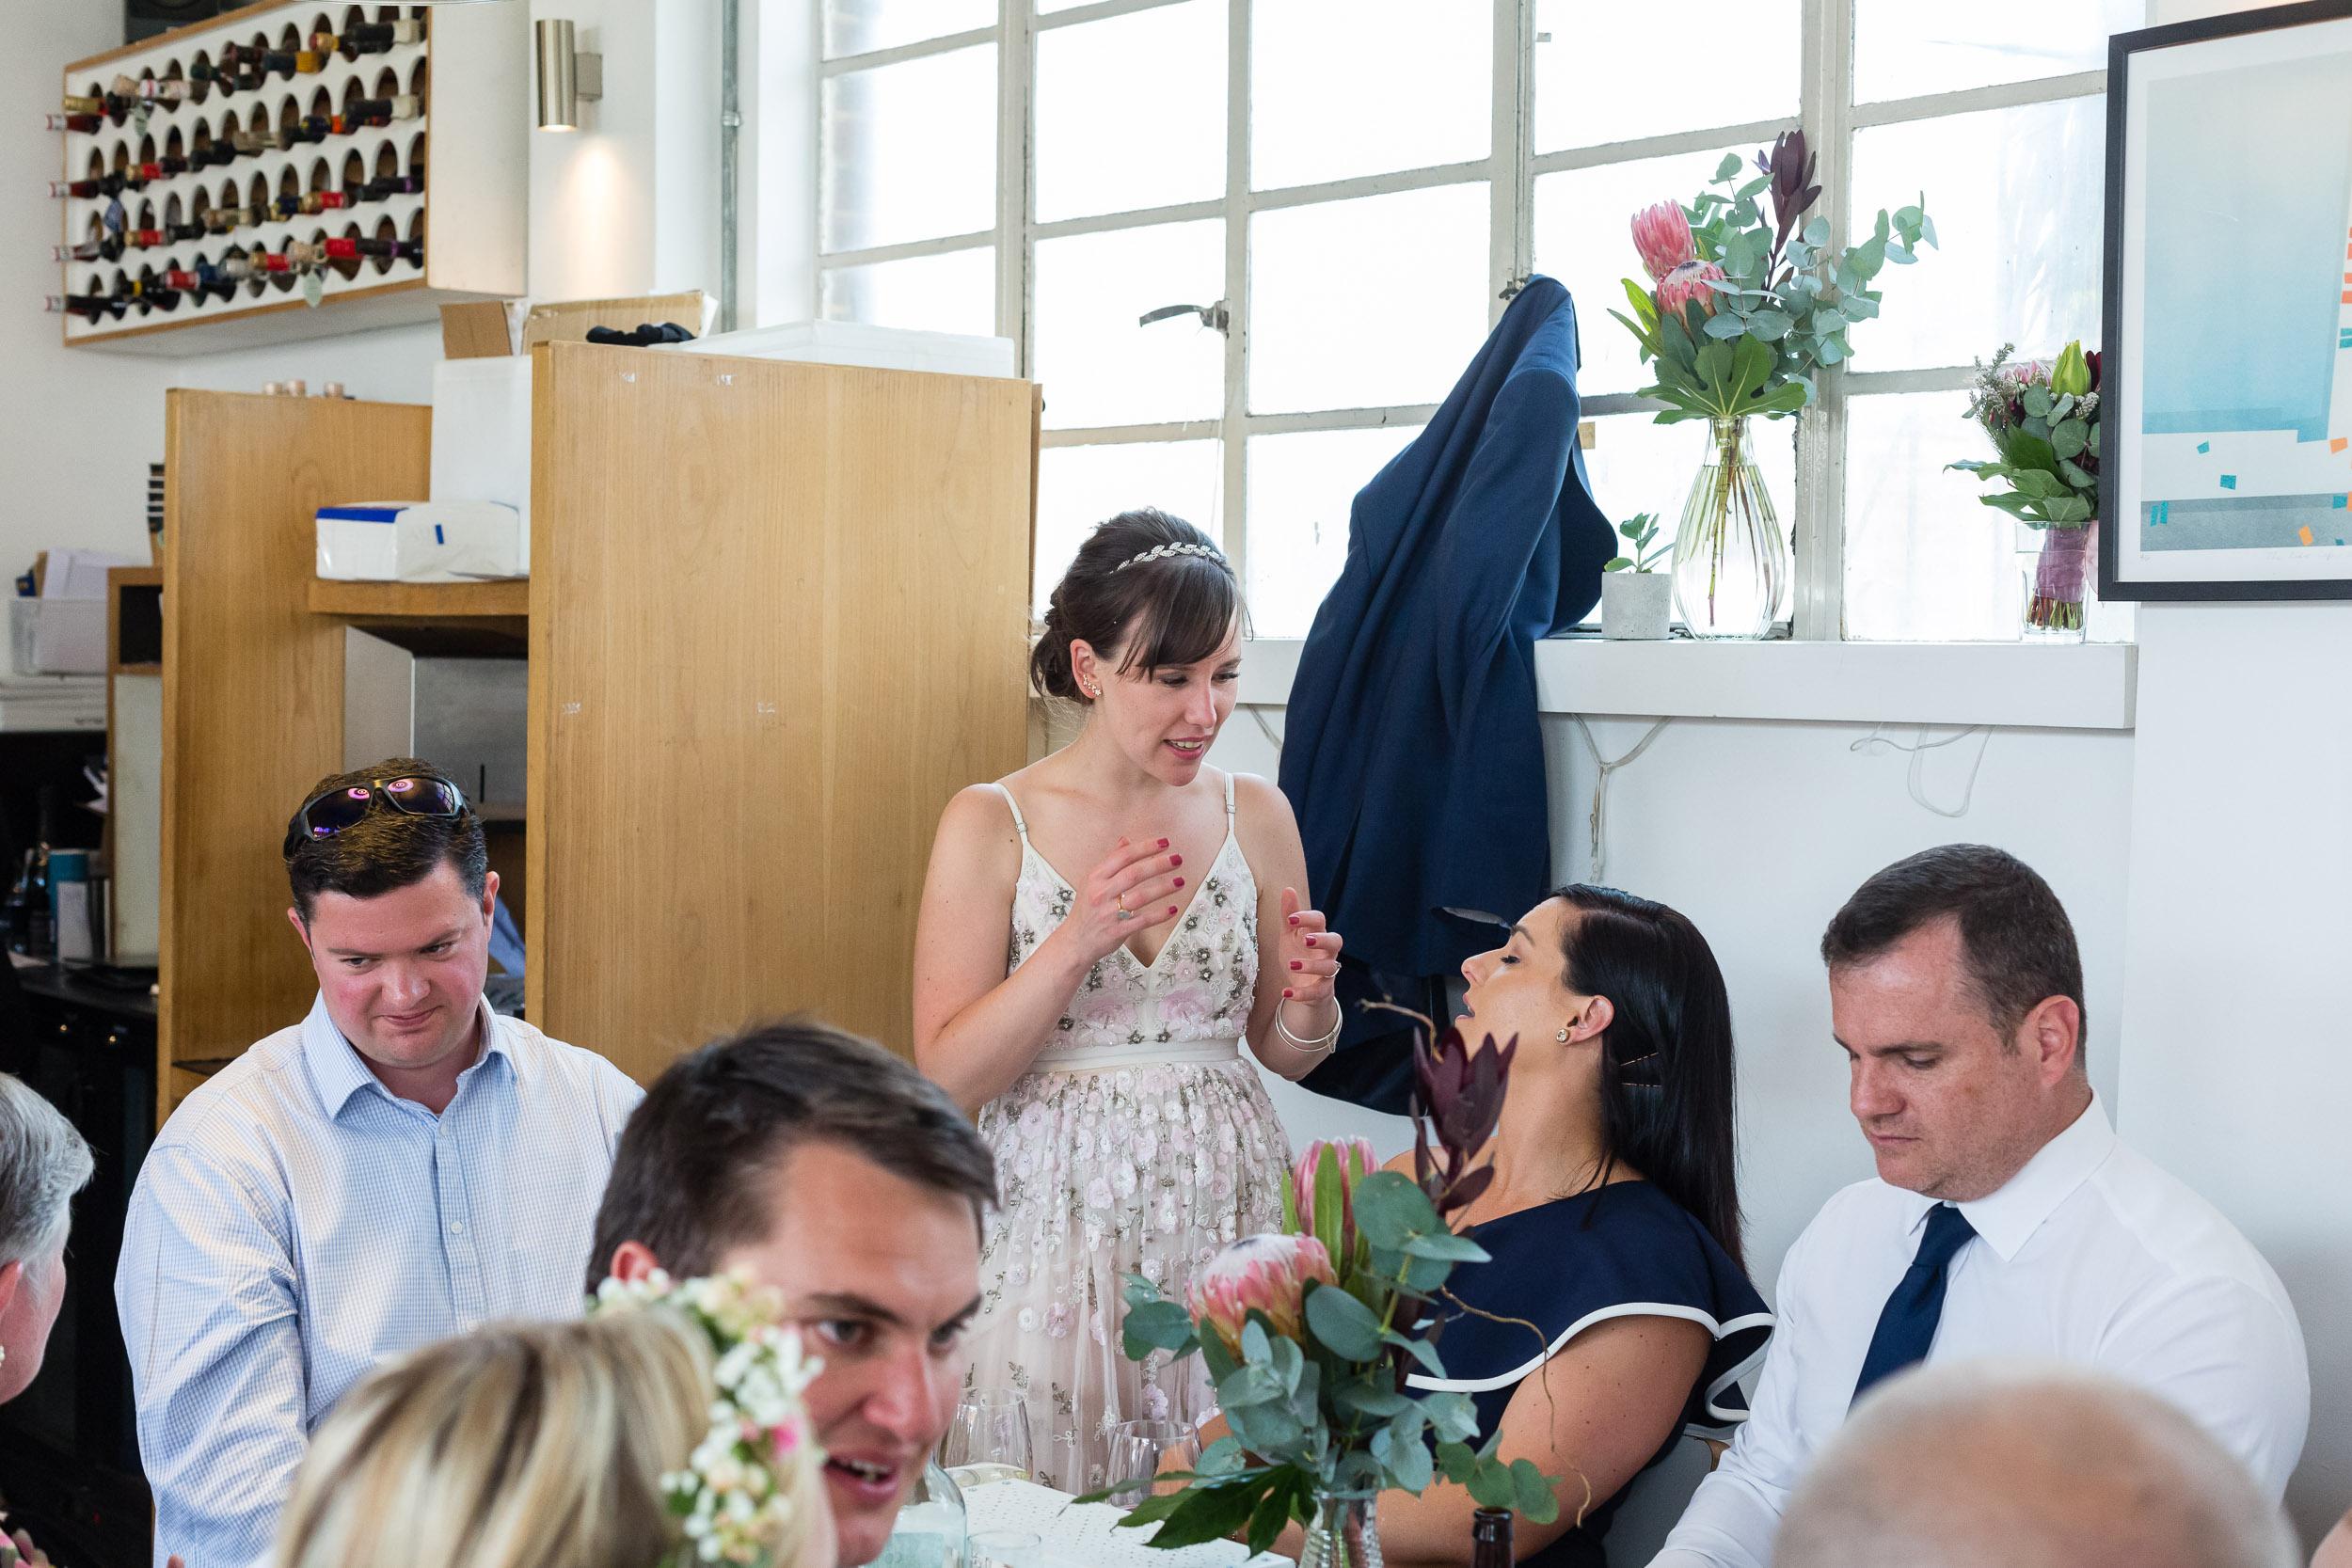 brockwell-lido-brixton-herne-hill-wedding-310.jpg